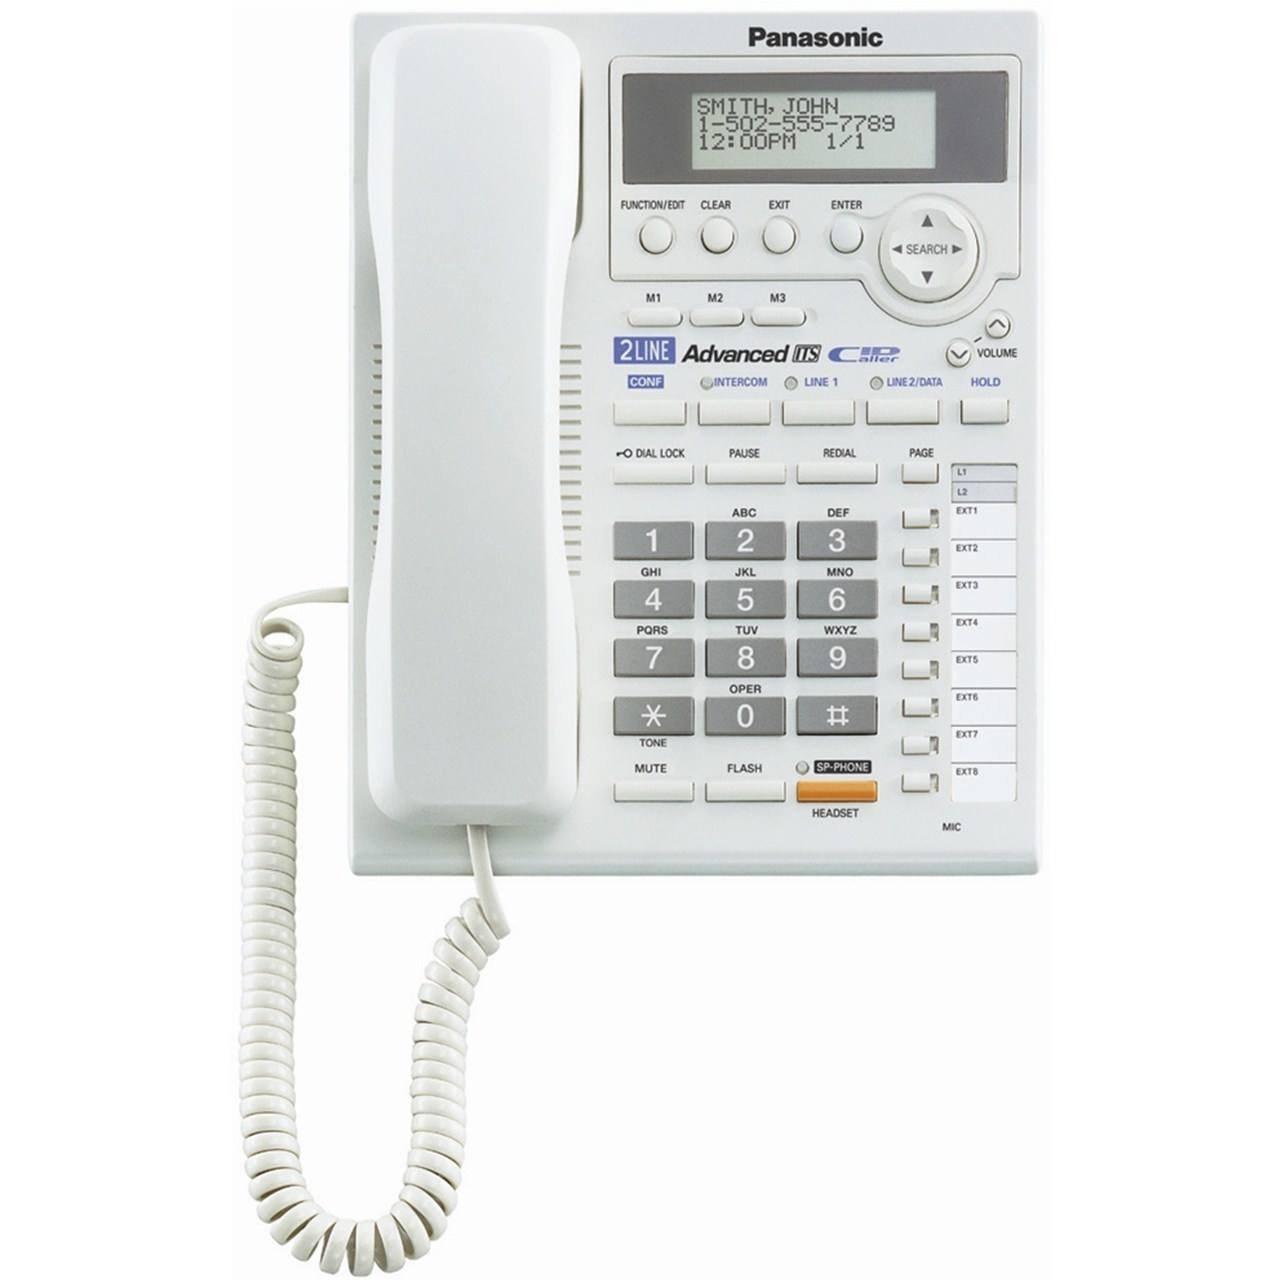 image تلفن باسیم پاناسونیک مدل تی اس 3282 تلفن پاناسونیک KX-TS3282 Corded Telephone